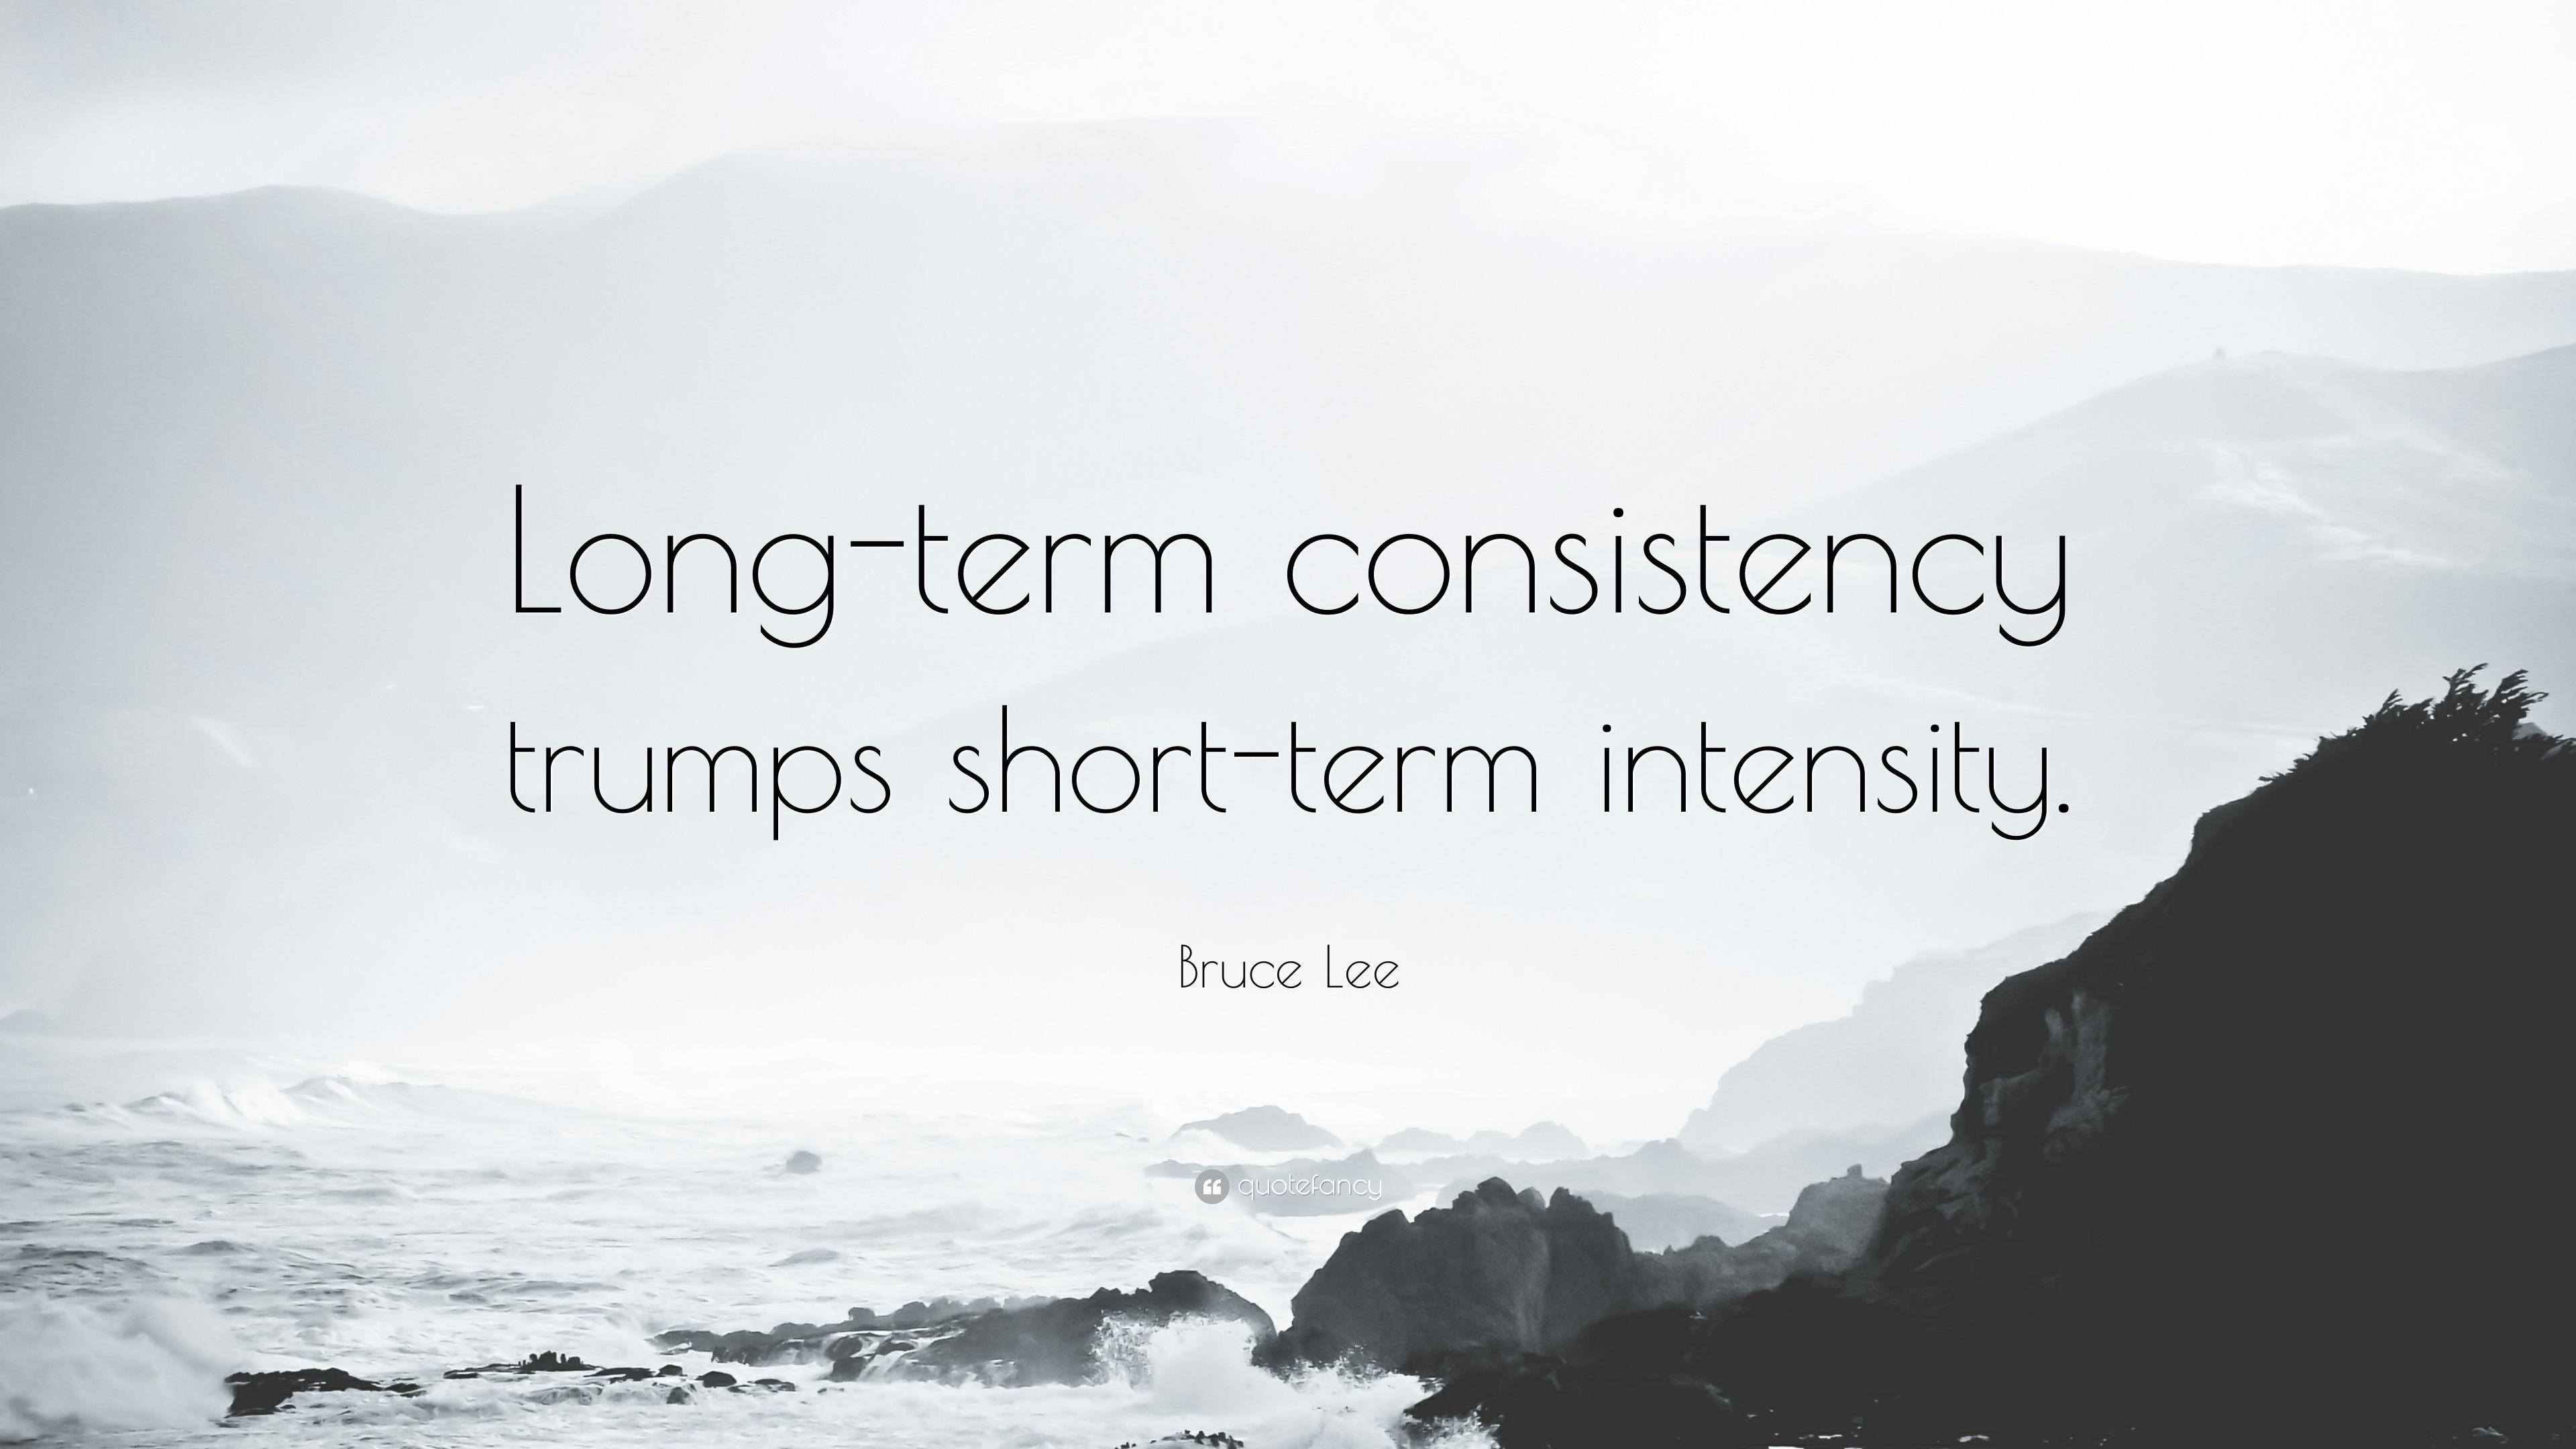 Consistency Quotes Wallpaper Bruce Lee Quote Long Term Consistency Trumps Short Term